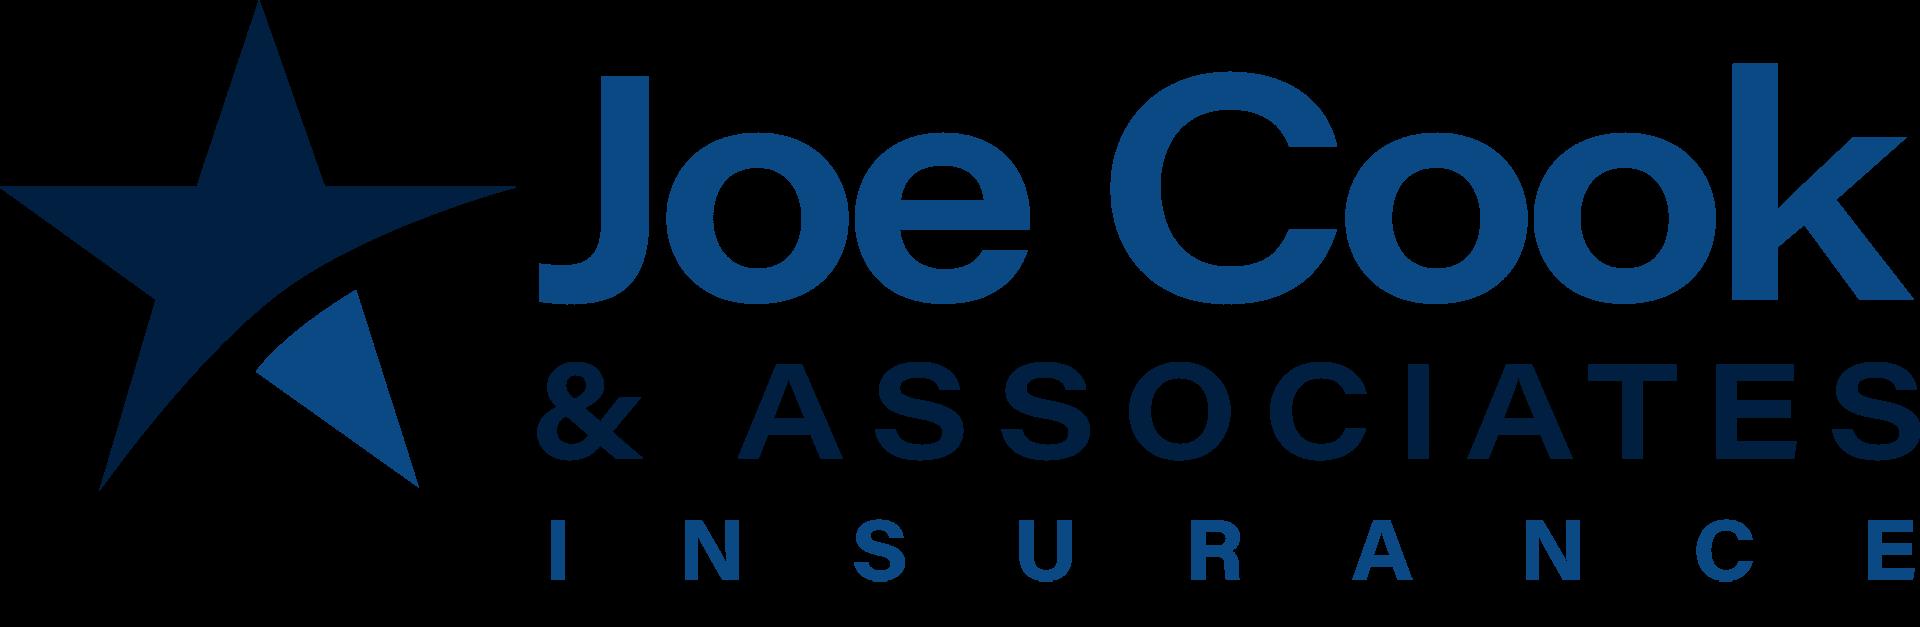 Joe Cook & Associates Insurance